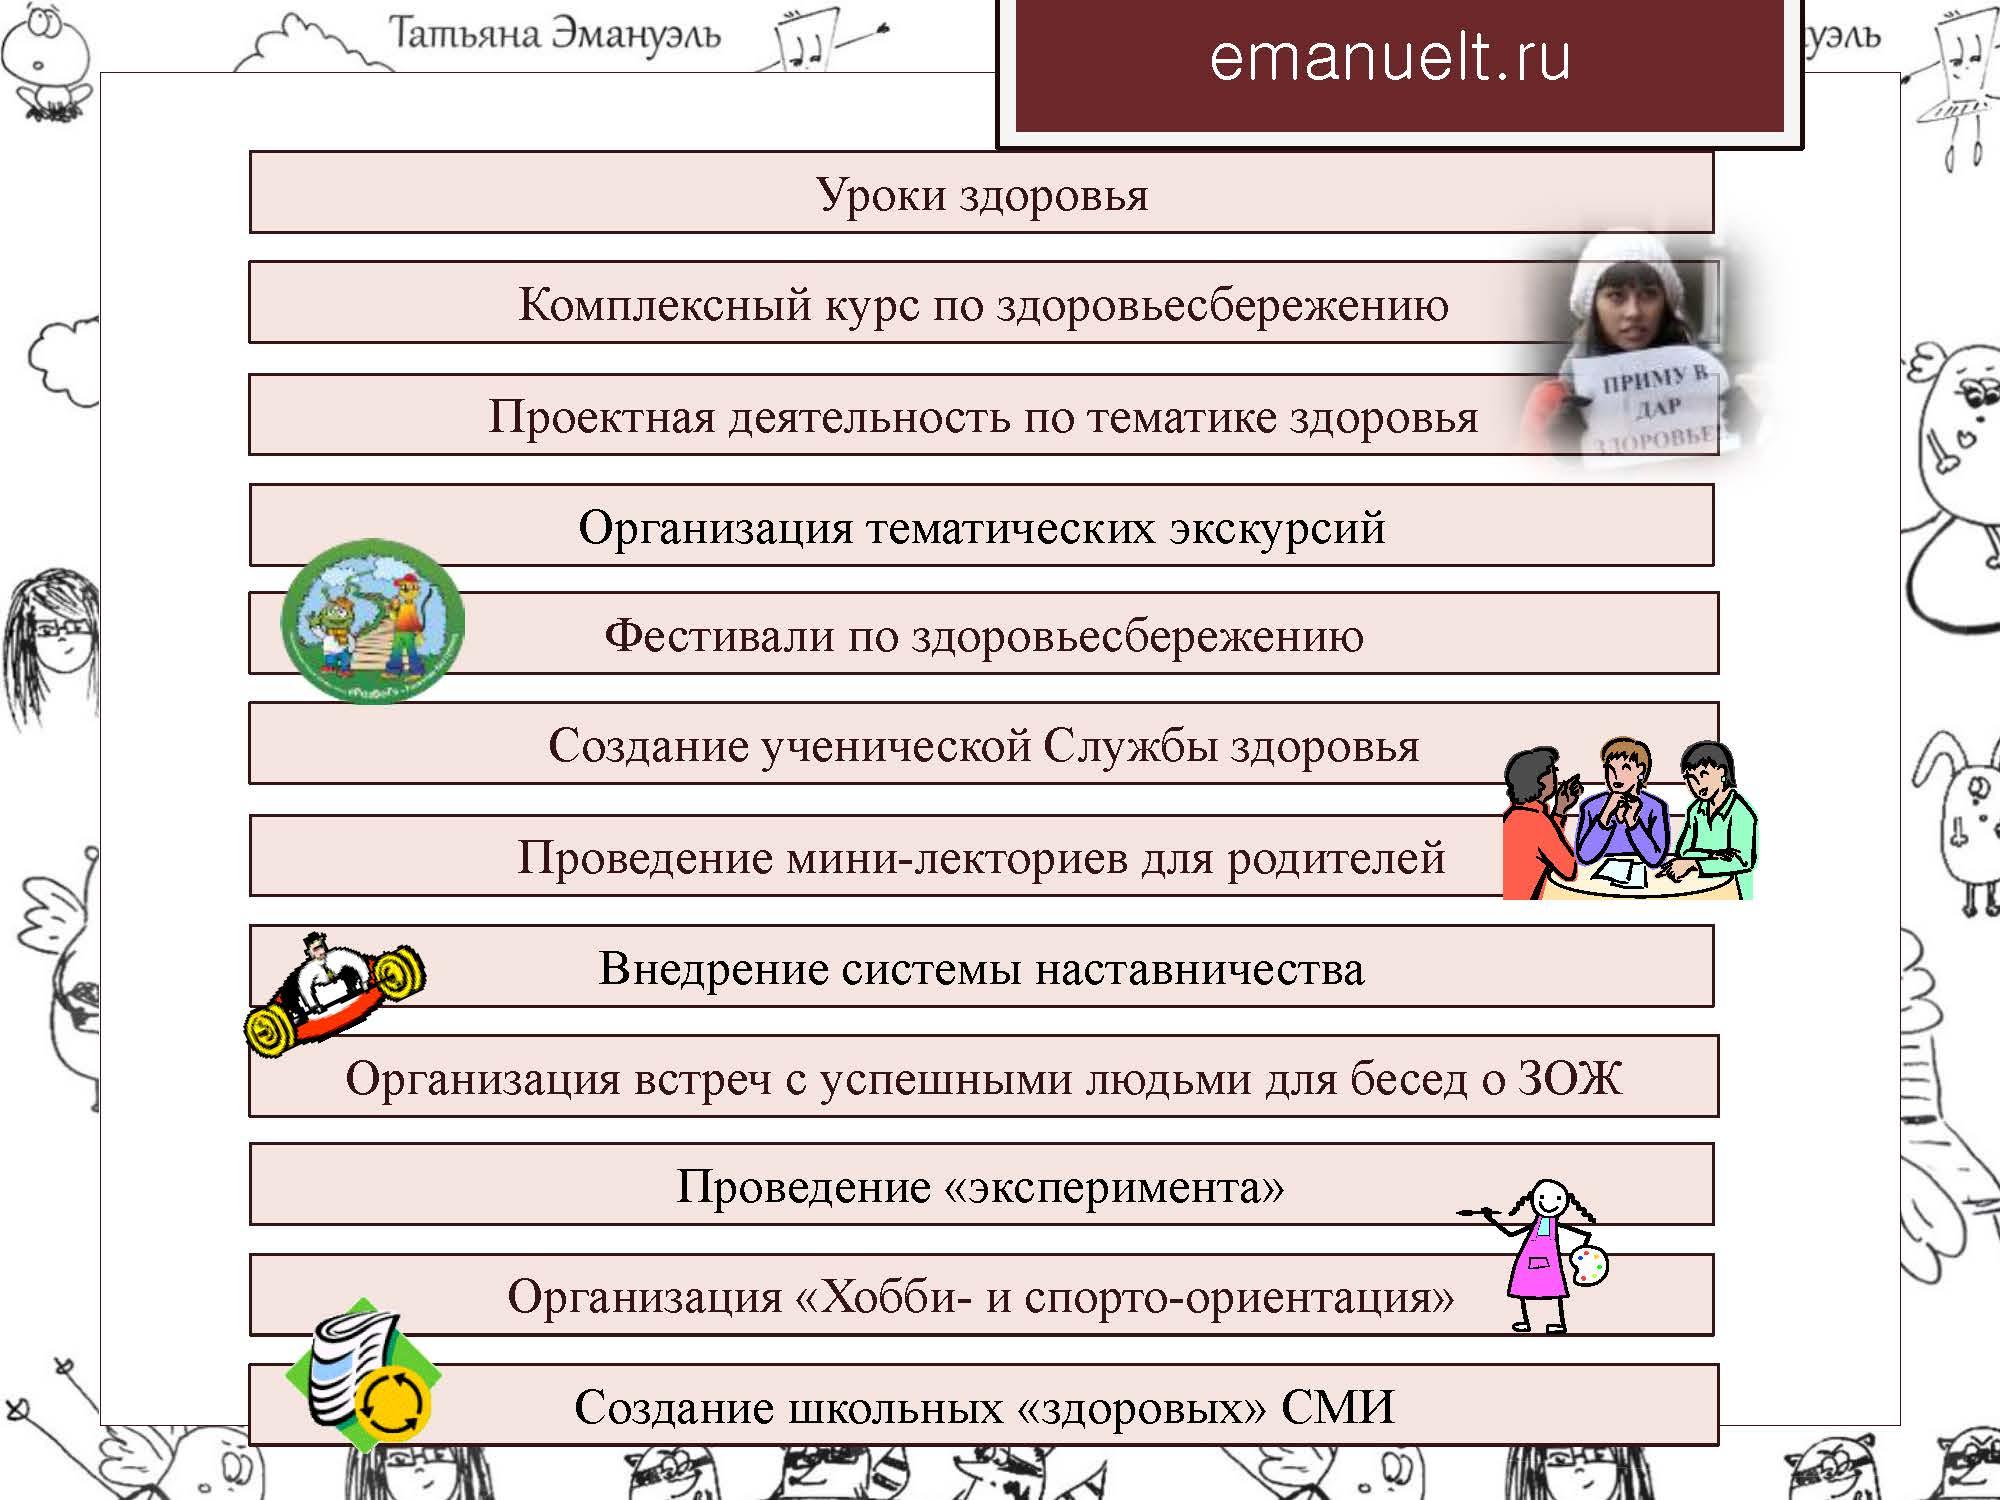 06 февраля эмануэль_Страница_086